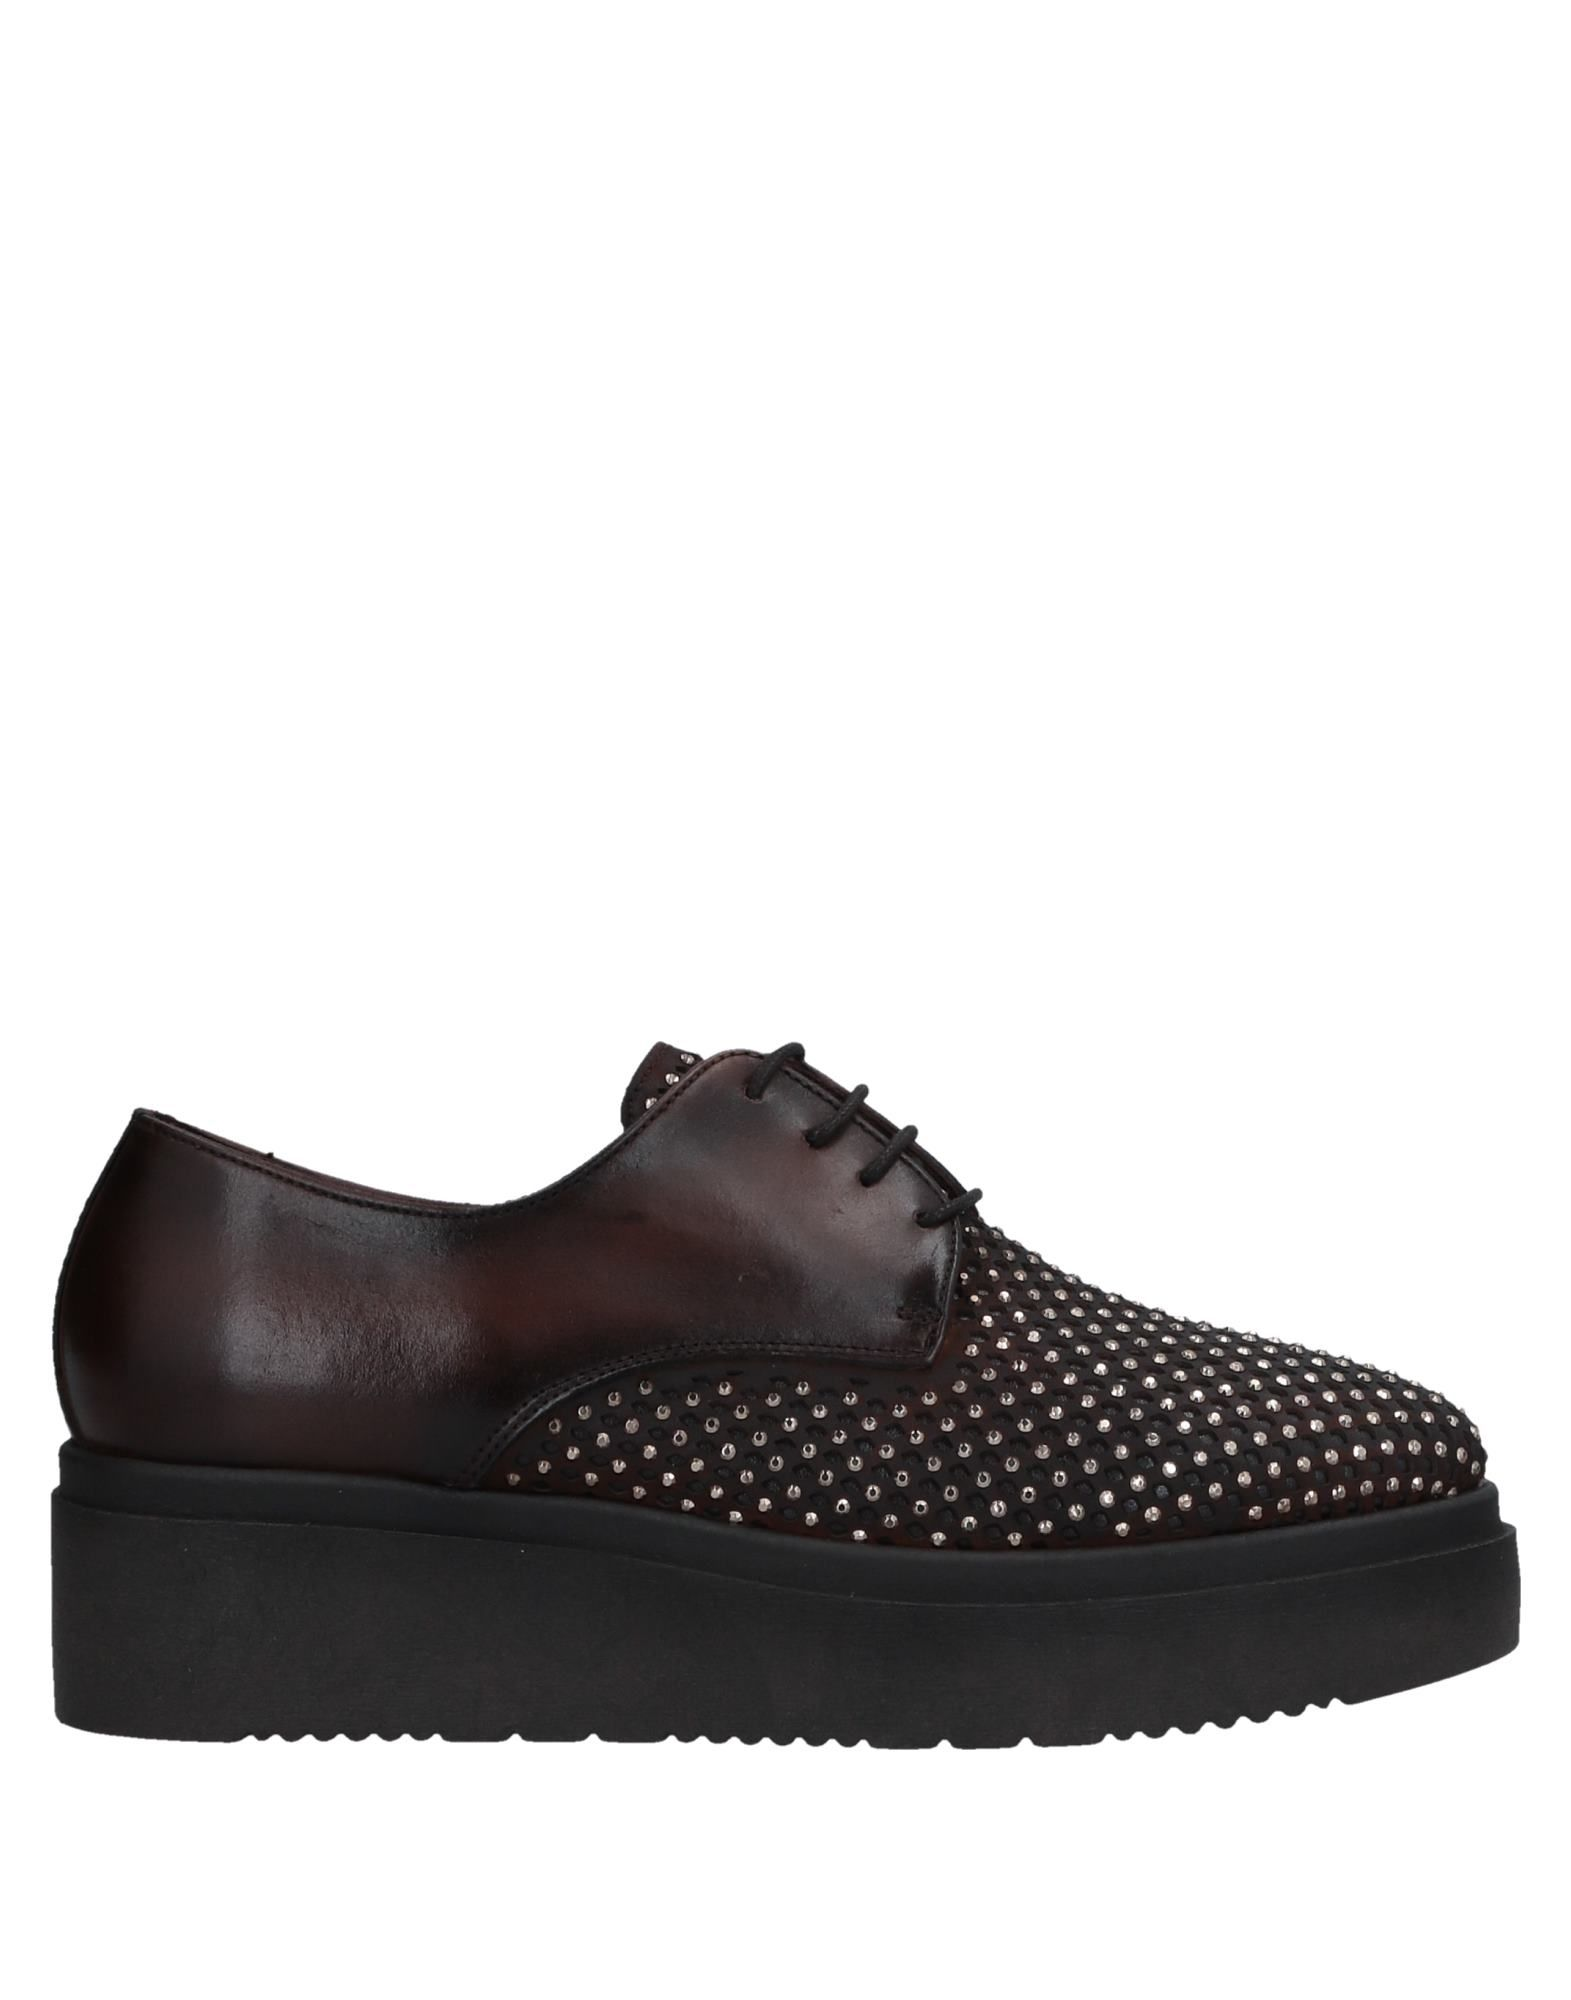 Donna Più Schnürschuhe Damen  11526850MK Gute Qualität beliebte Schuhe